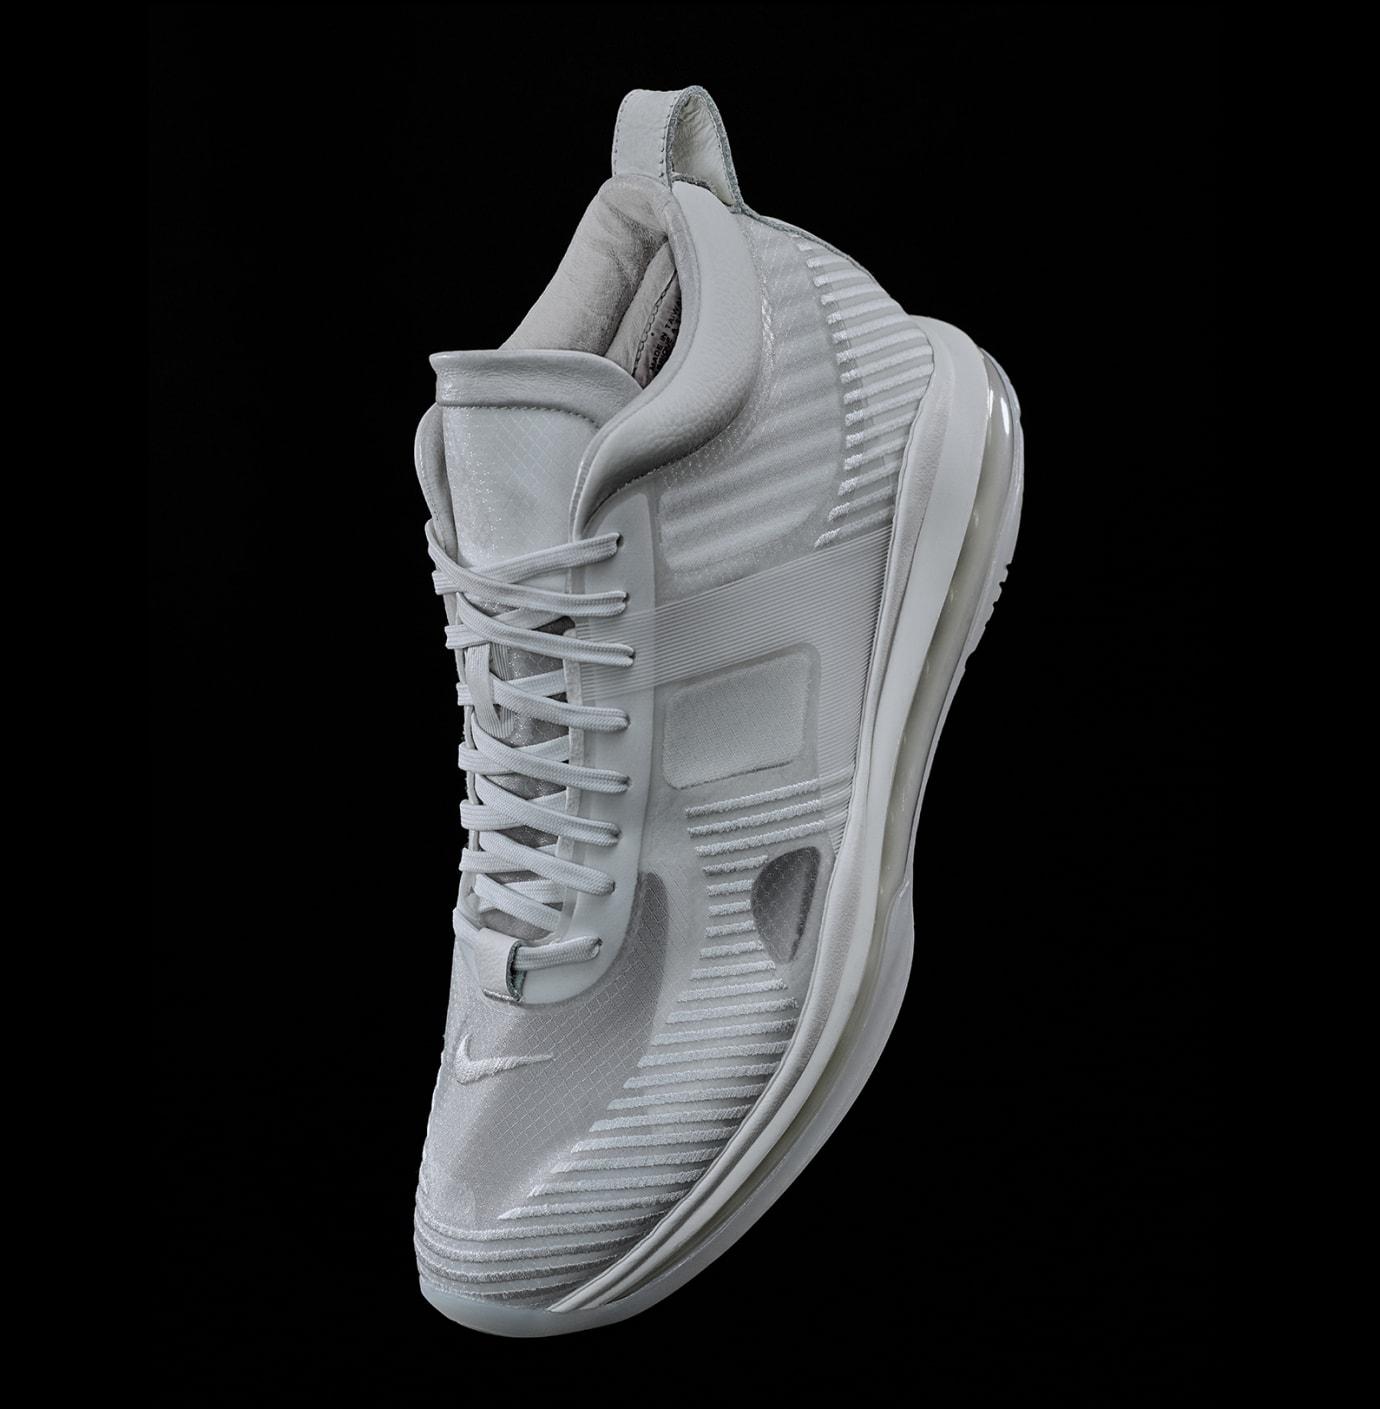 9c066cad4122e John Elliott x Nike LeBron Icon QS Friends and Family  White ...